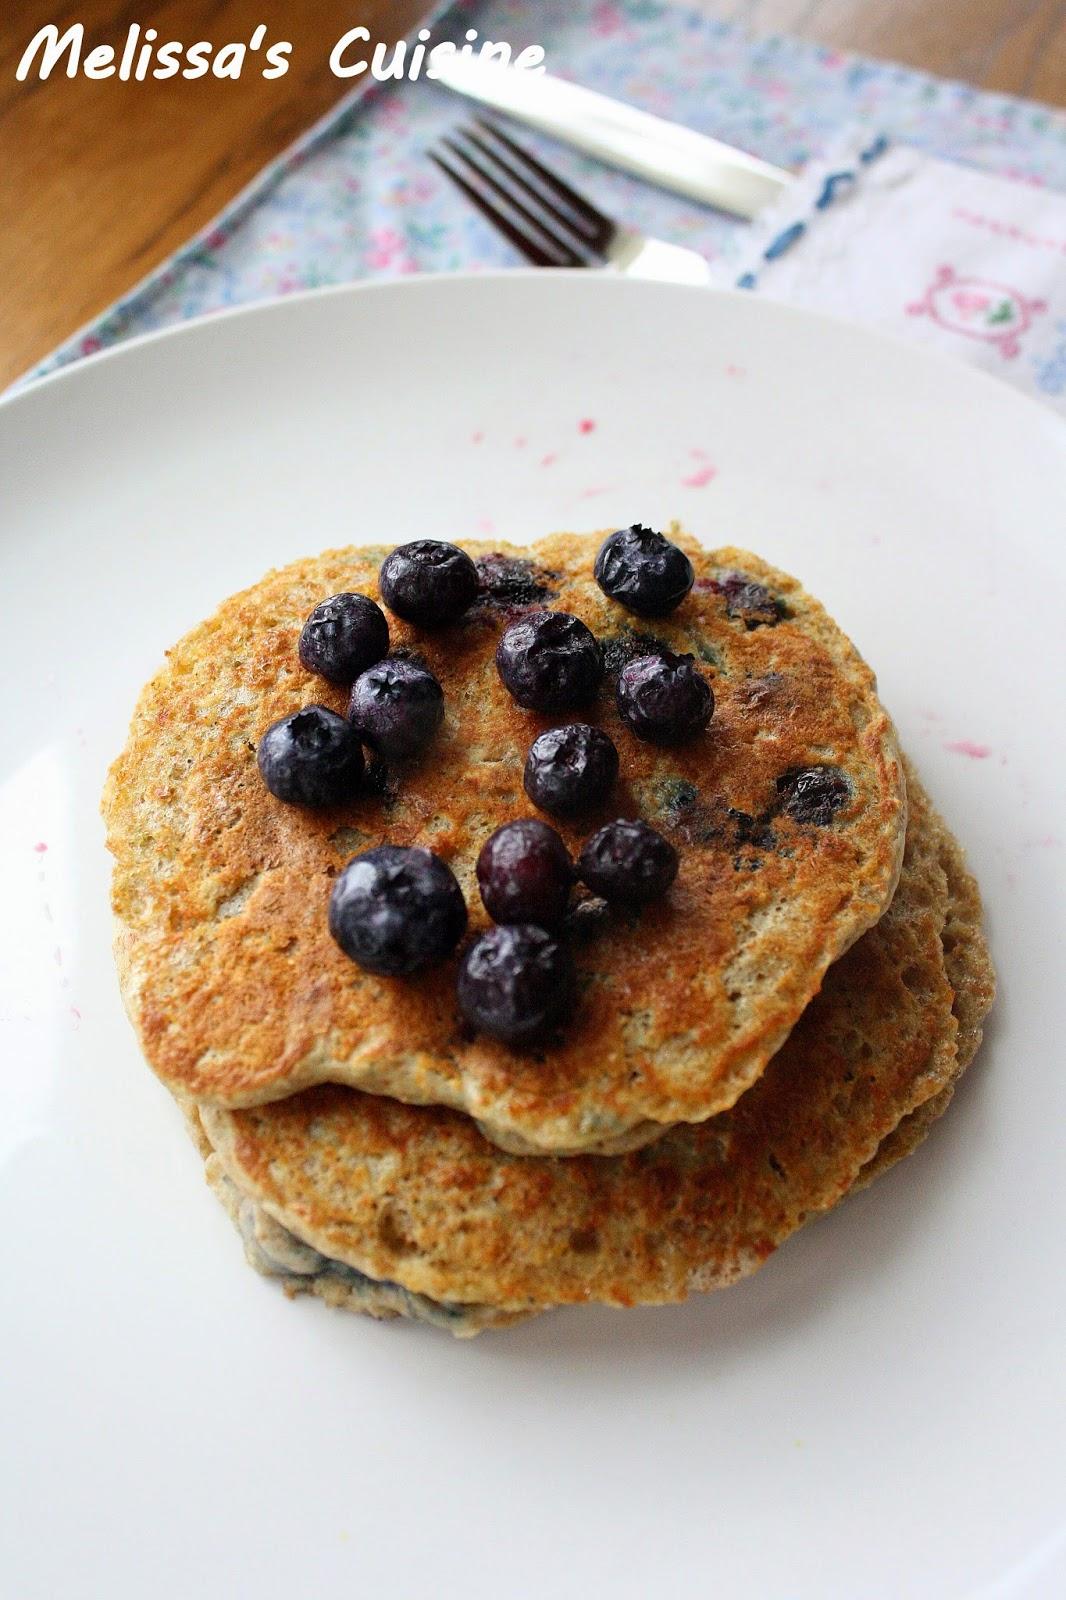 Melissa's Cuisine: Oatmeal Blueberry Pancakes